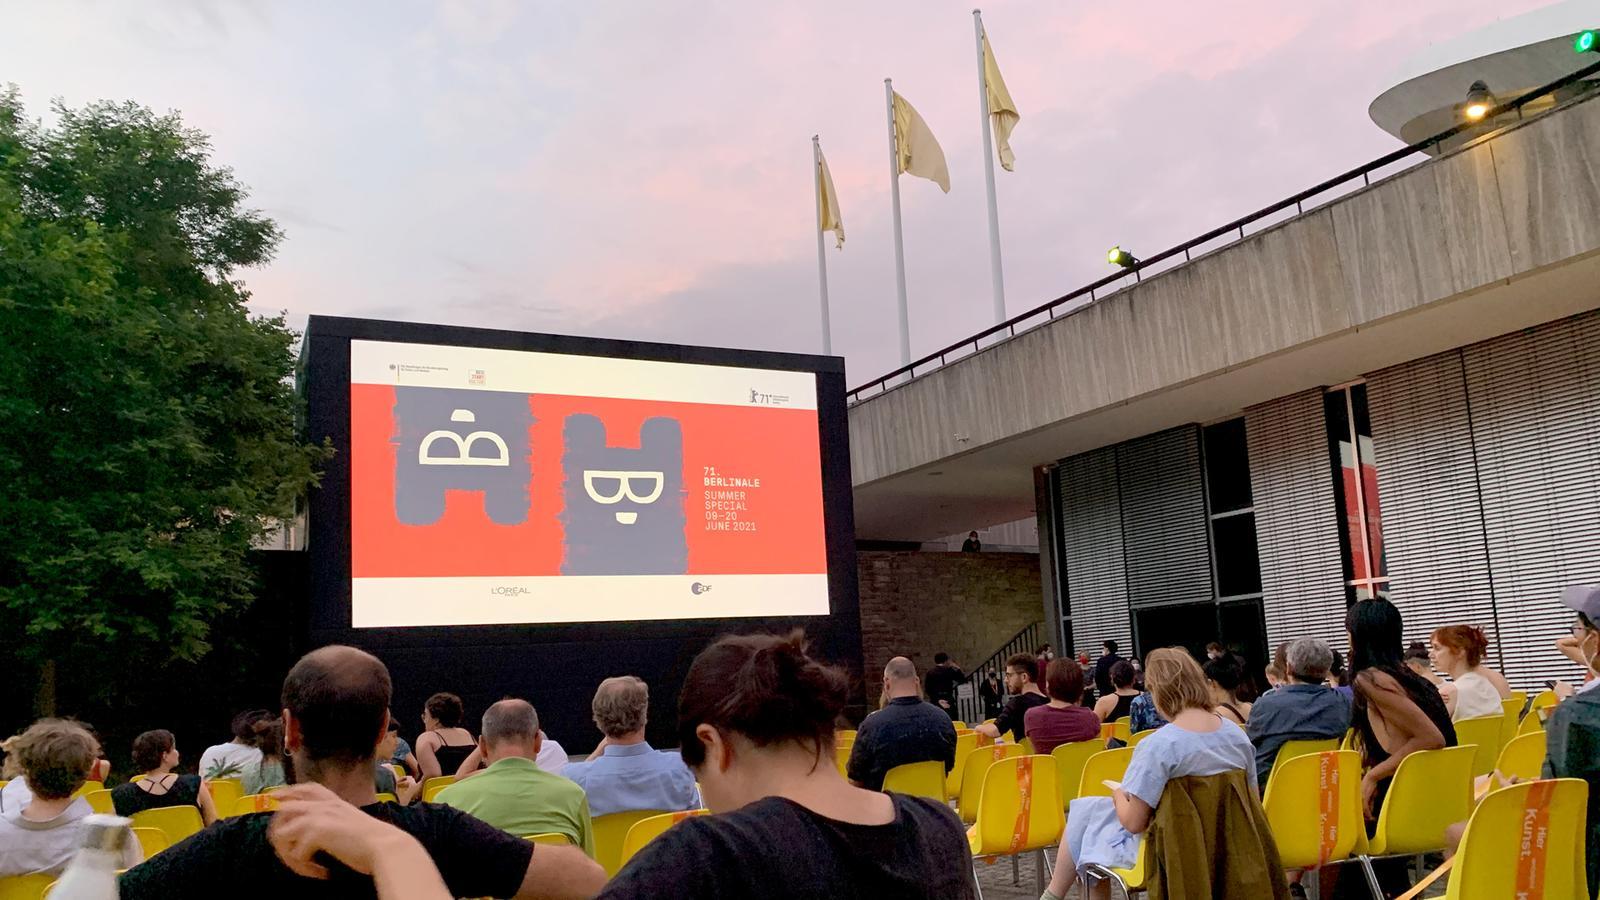 Berlinale Open Air